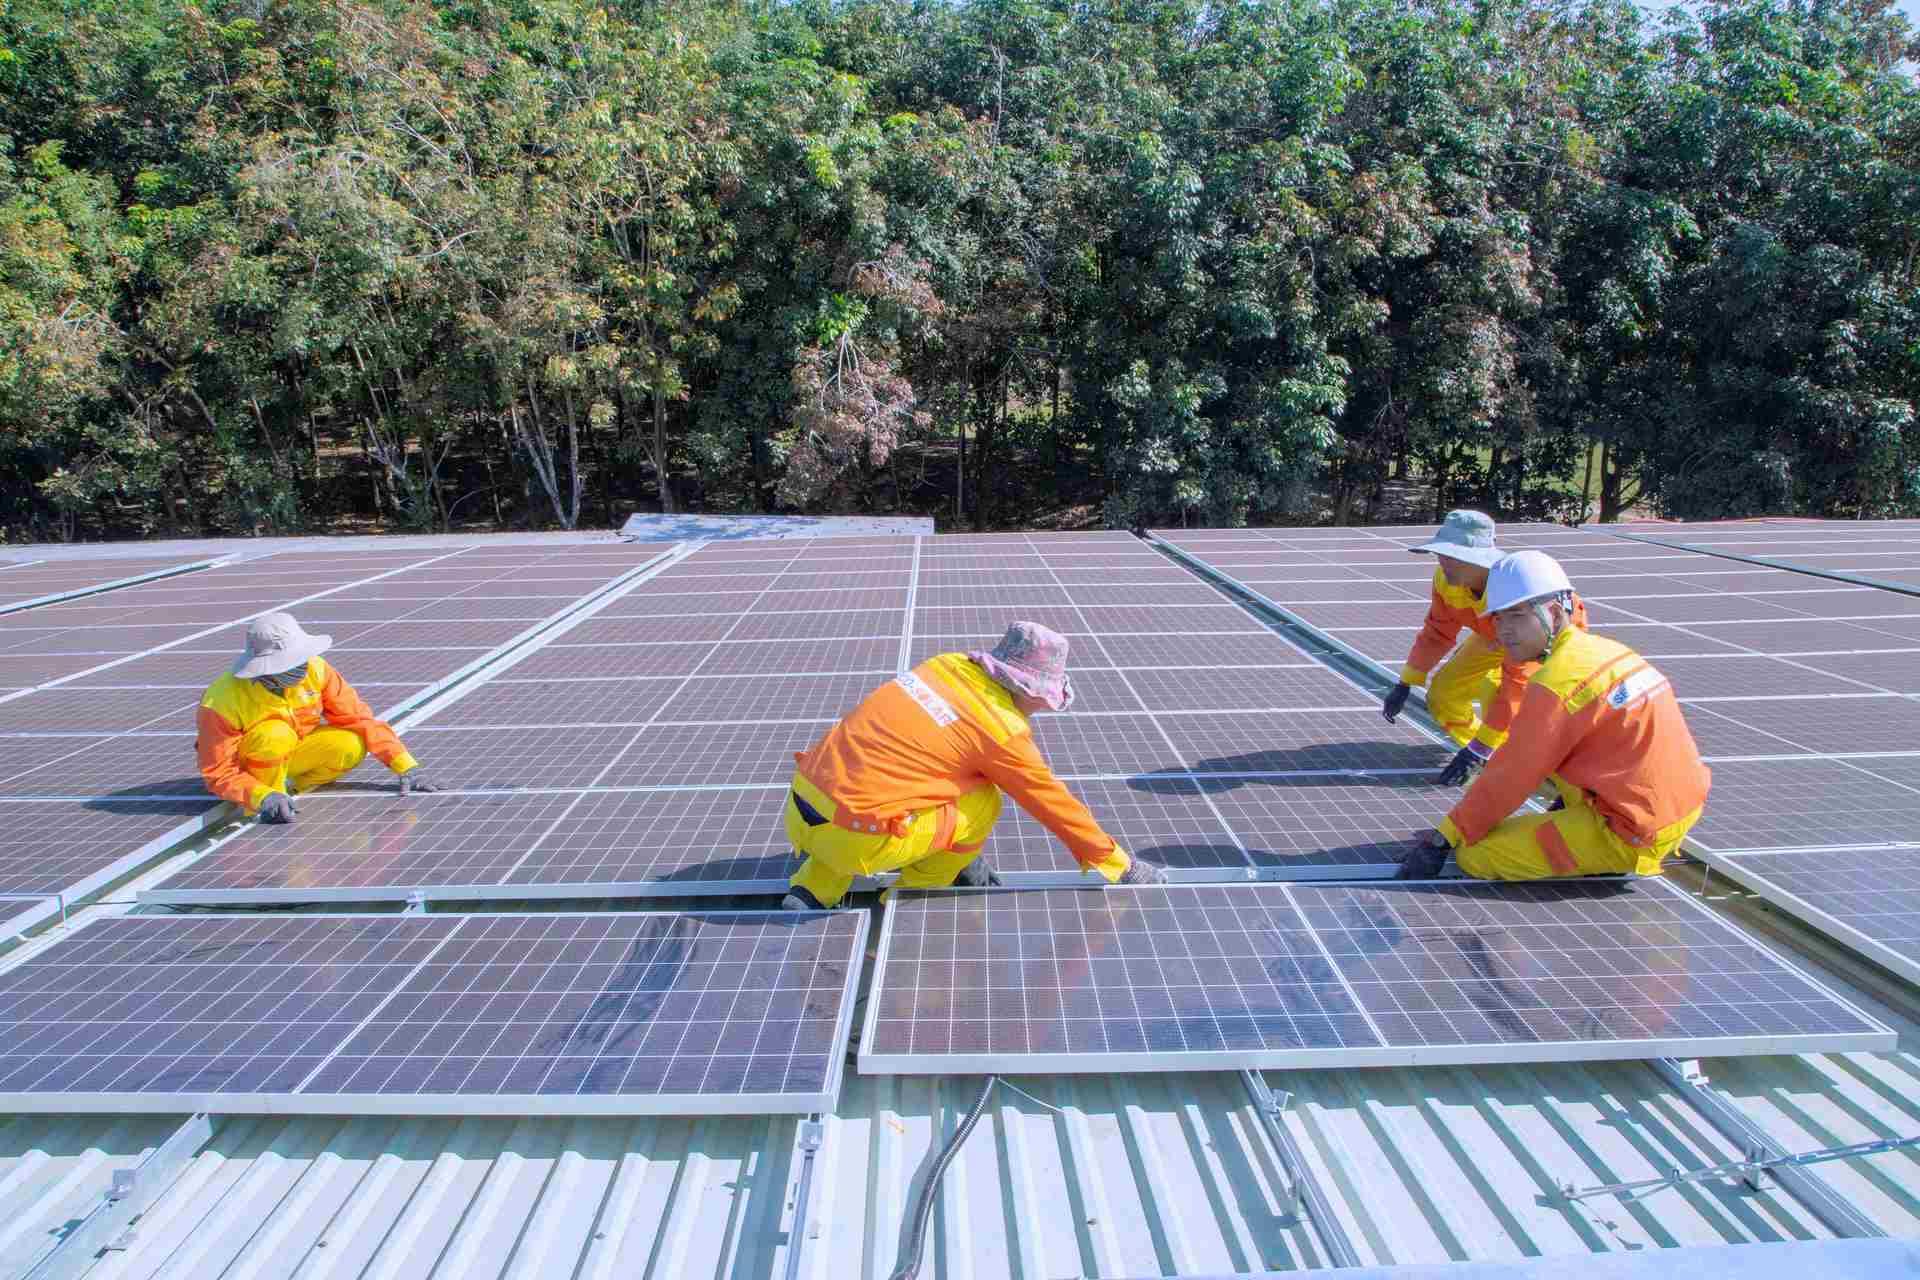 Commercial Solar Panels in Mondovi Wisconsin USA